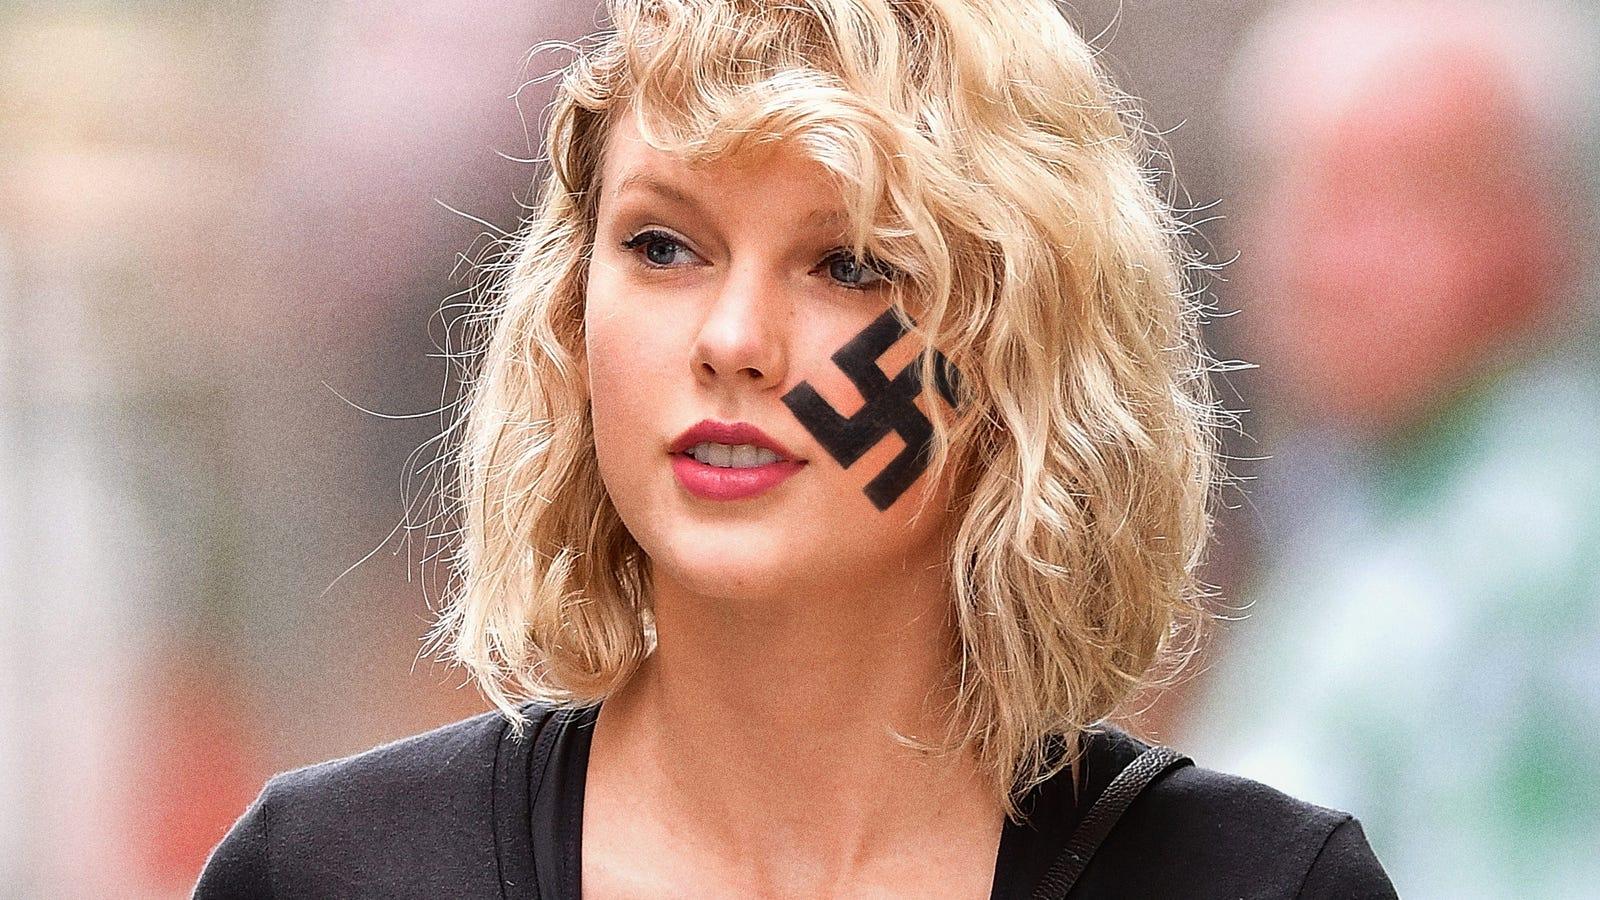 Taylor Swift Grateful Kanye West Controversy Taking Heat Off New Swastika Tattoo